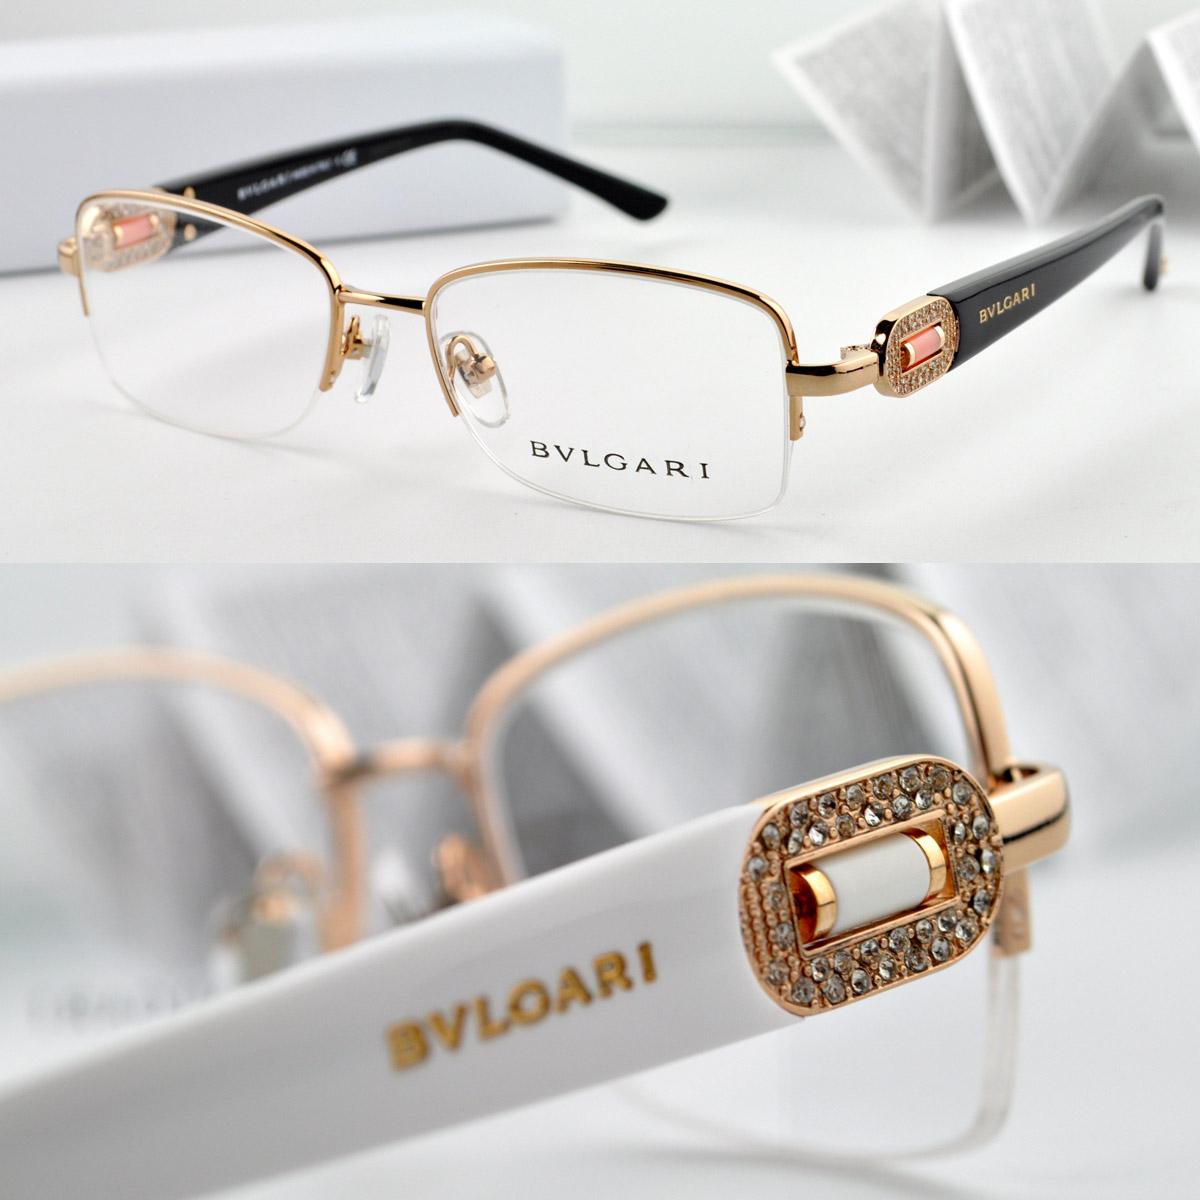 Eyeglass Frame Tattoo : Tattoo Eyeglass Frames Promotion-Online Shopping for ...